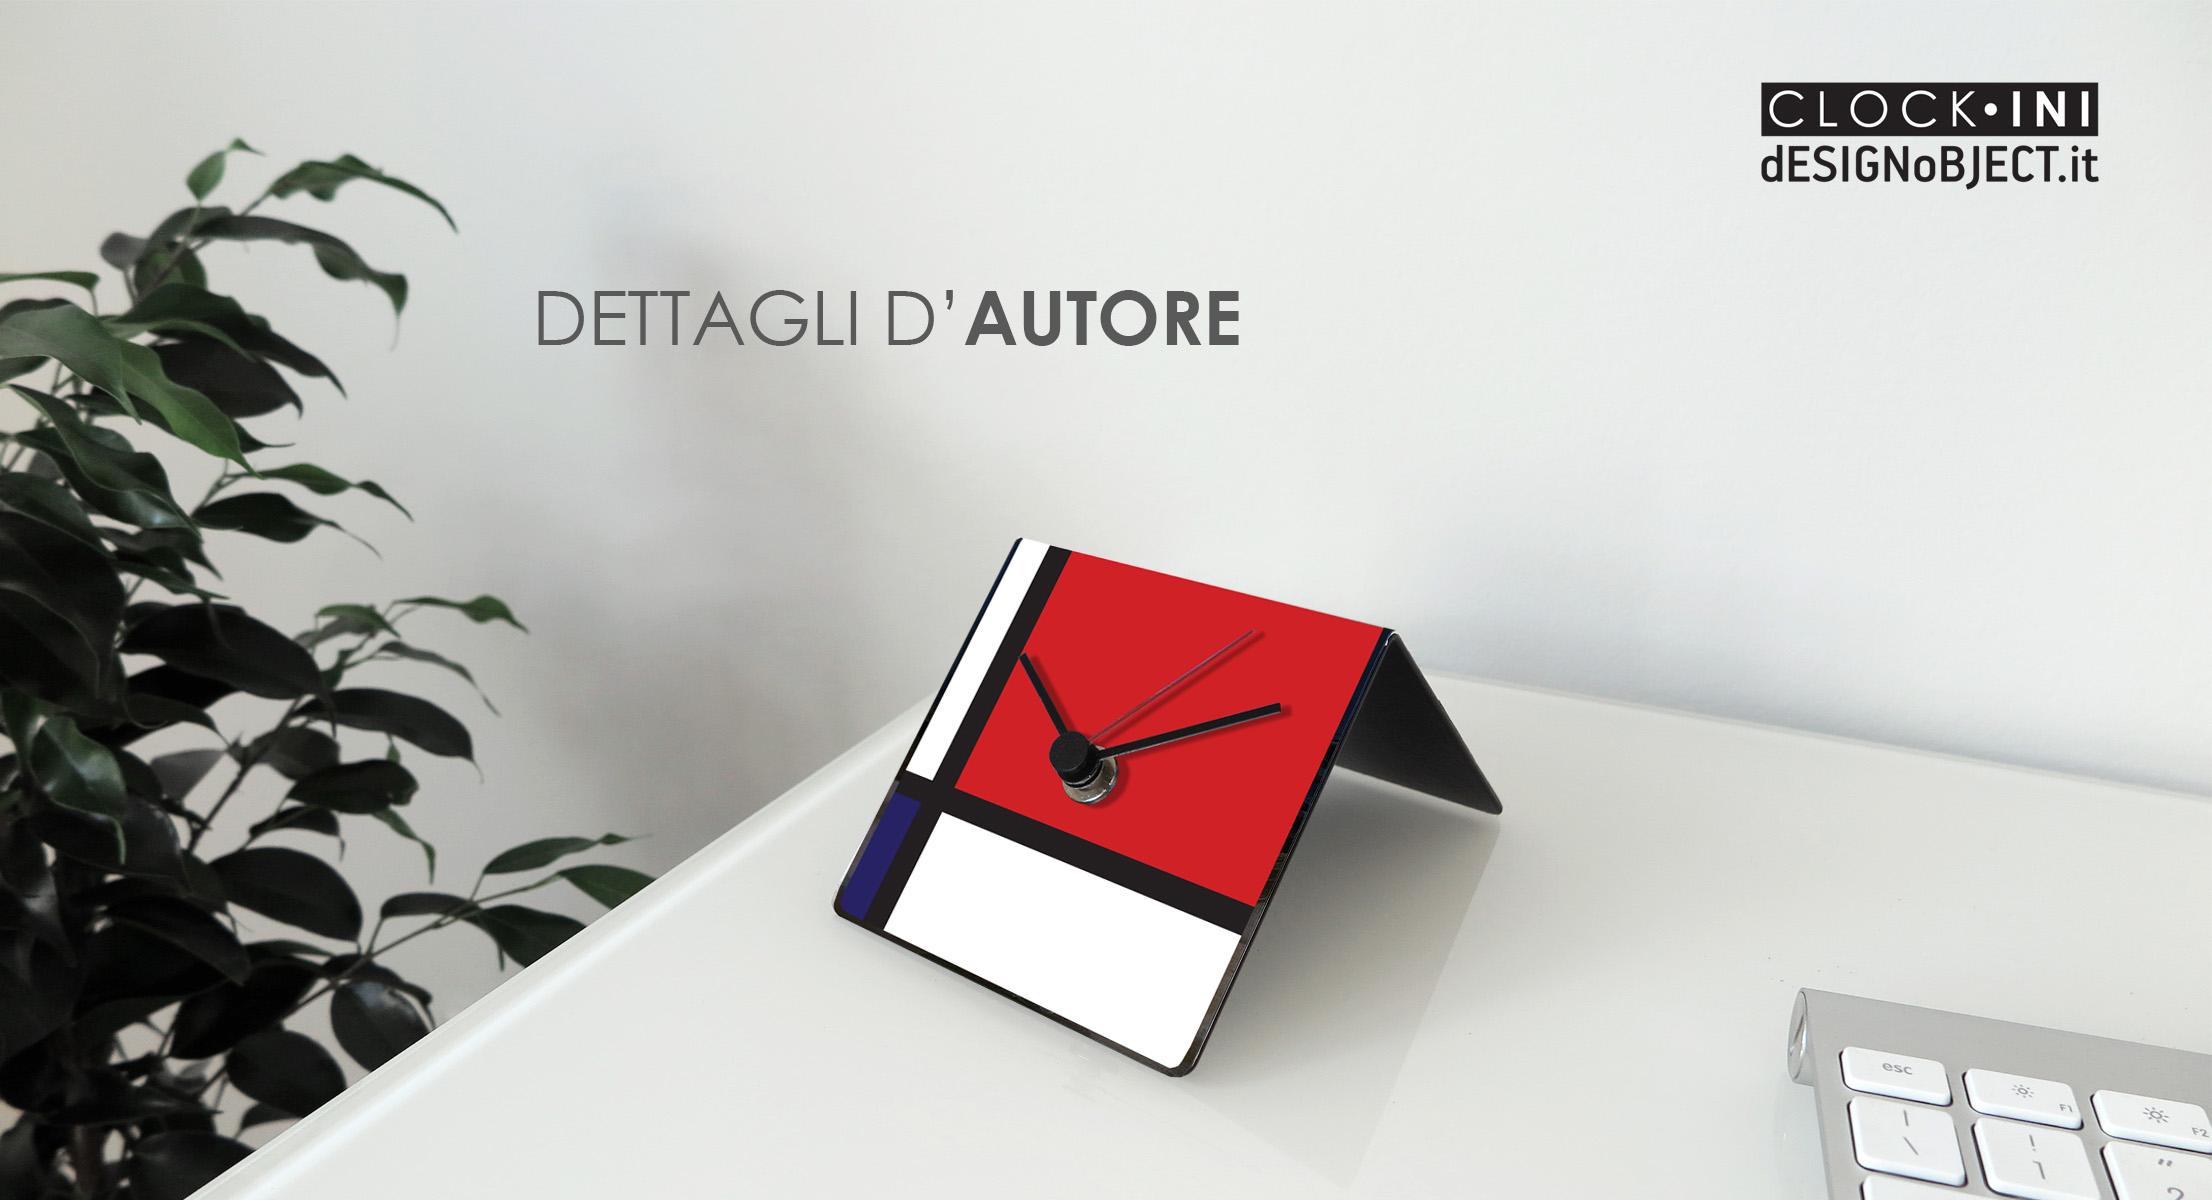 Orologi-arte-design-mondrian-designobject